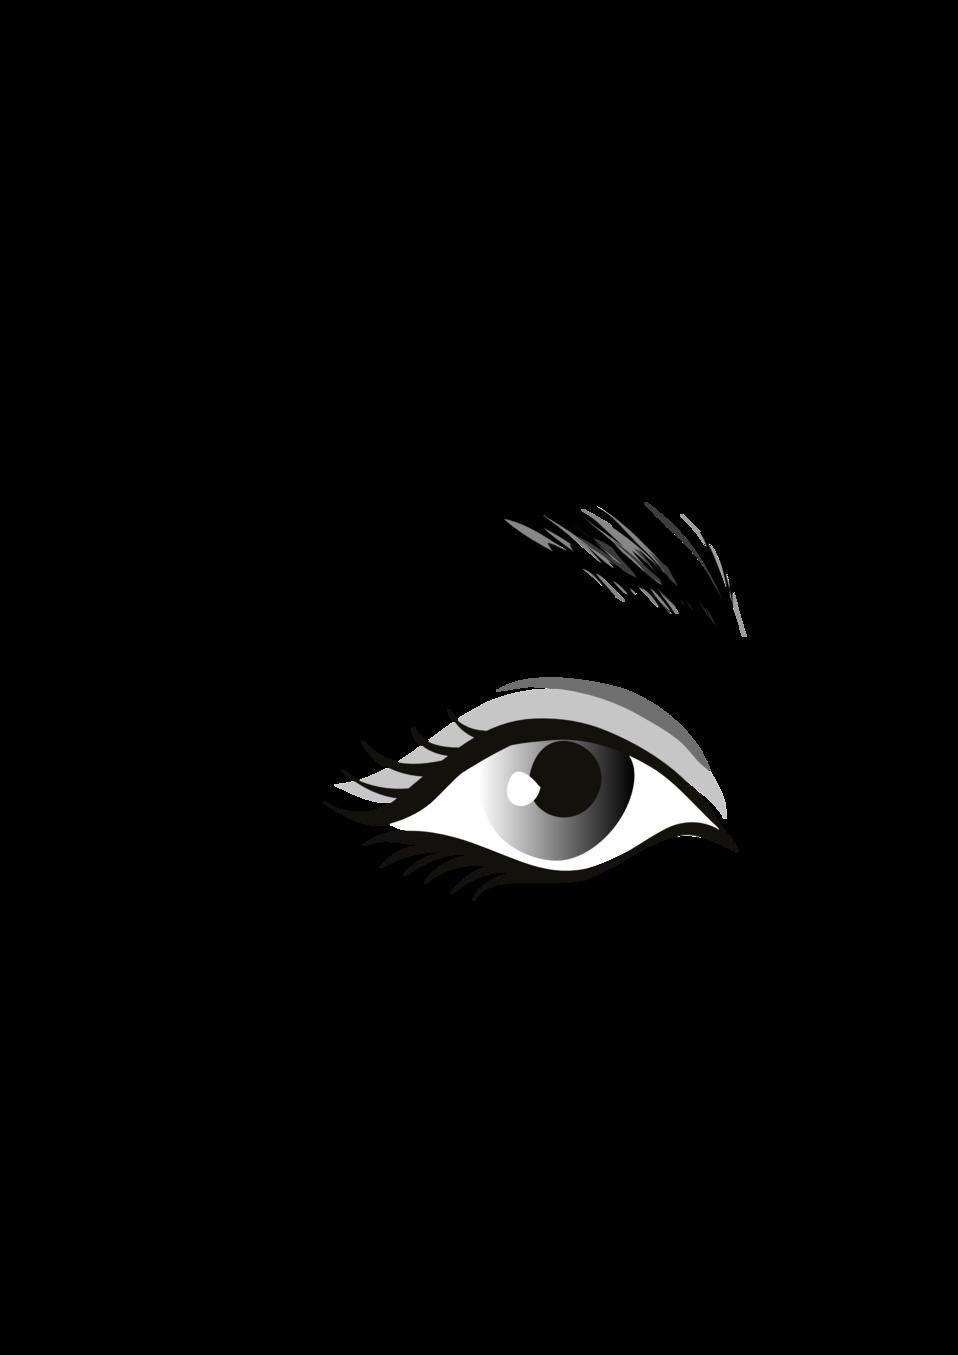 Eyelash clipart illustration. Public domain clip art